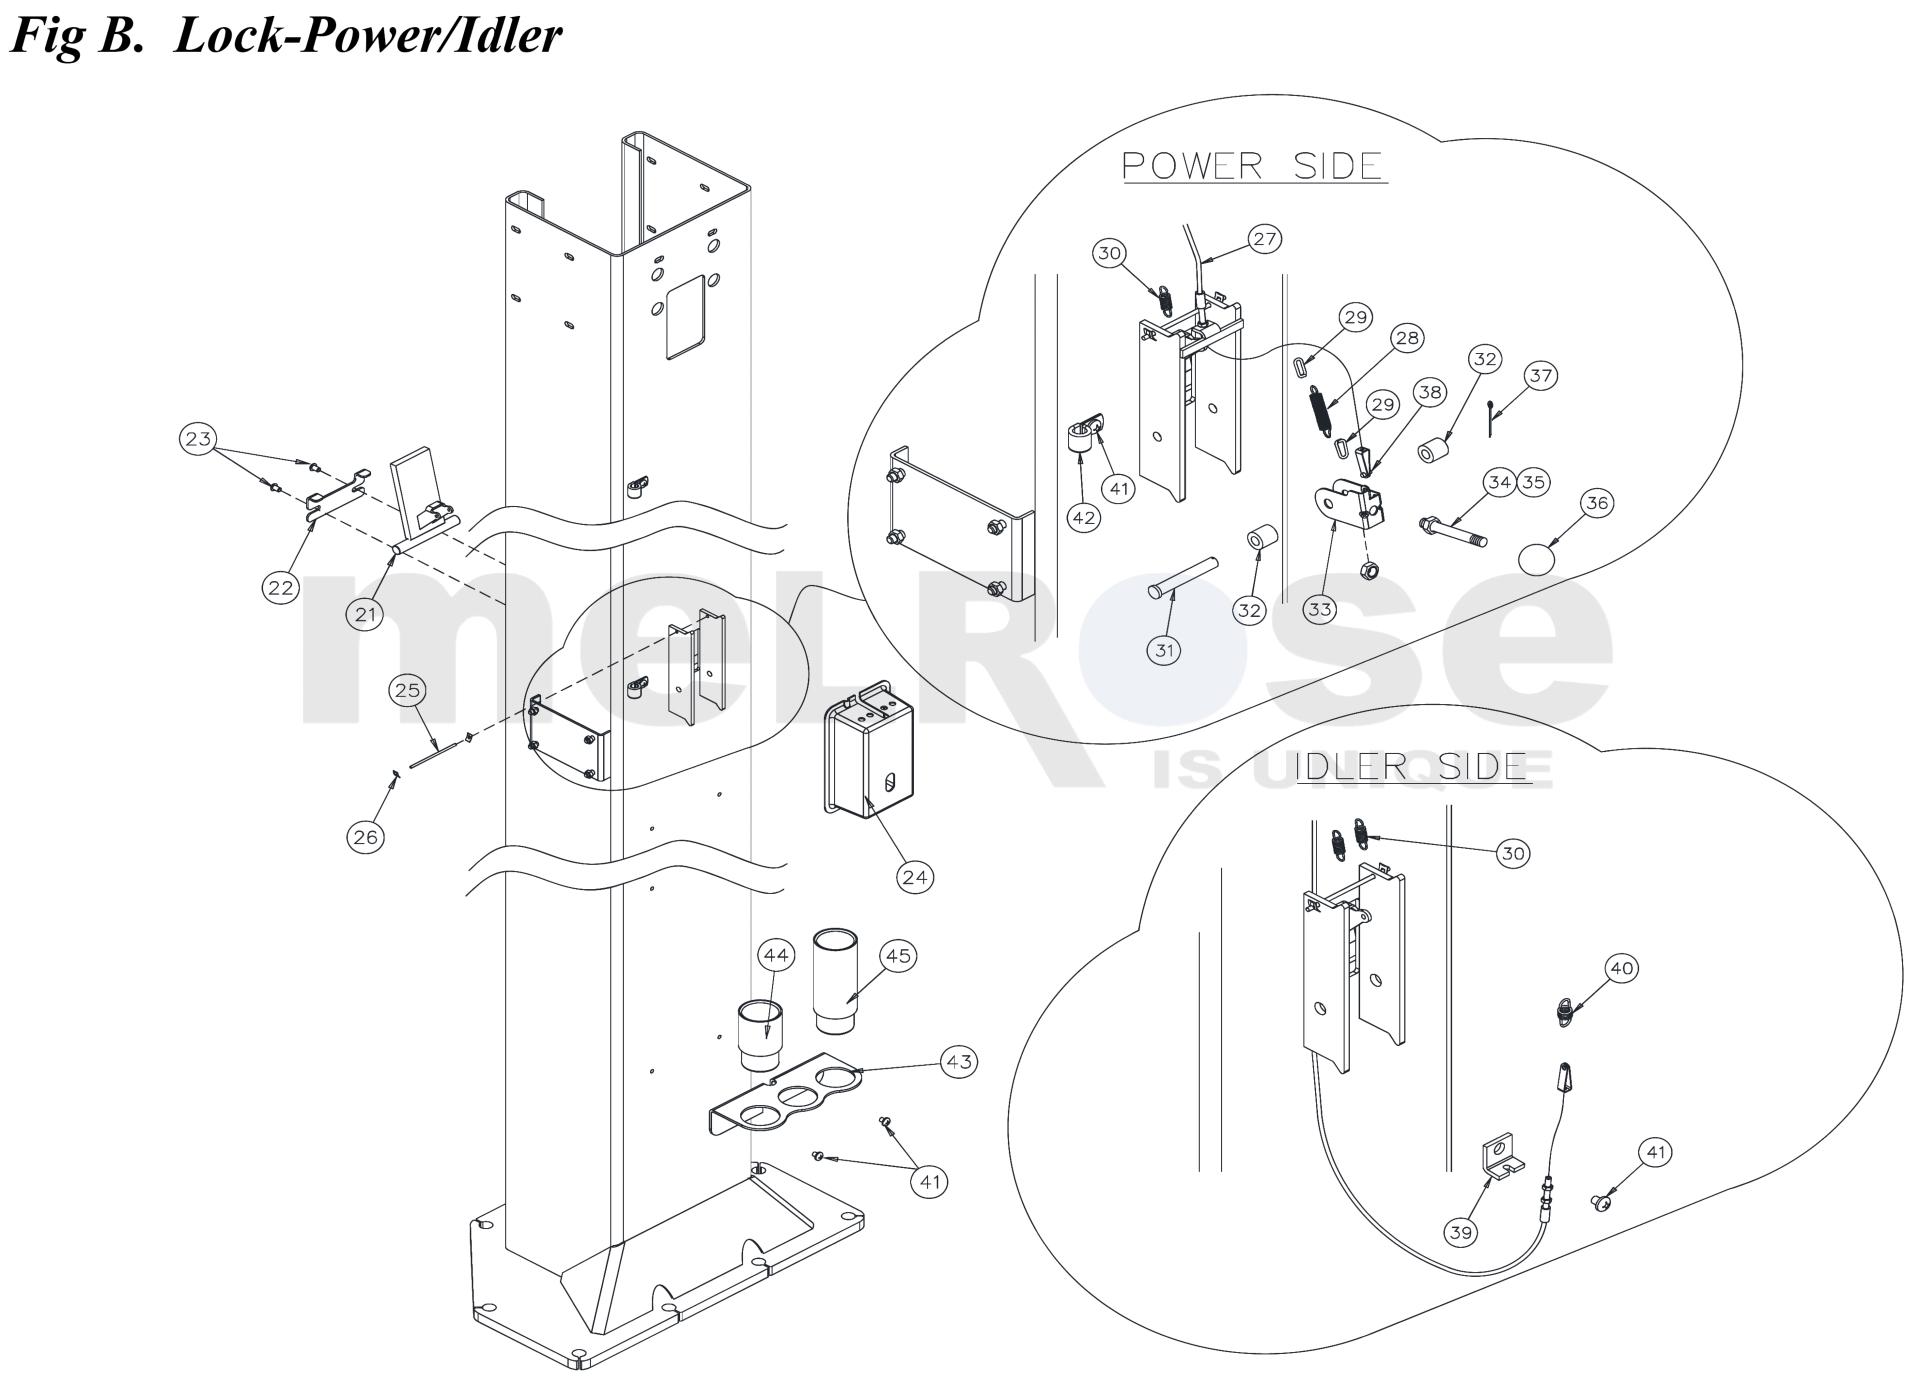 cl12-b.-lock-power-idler-marked.jpg